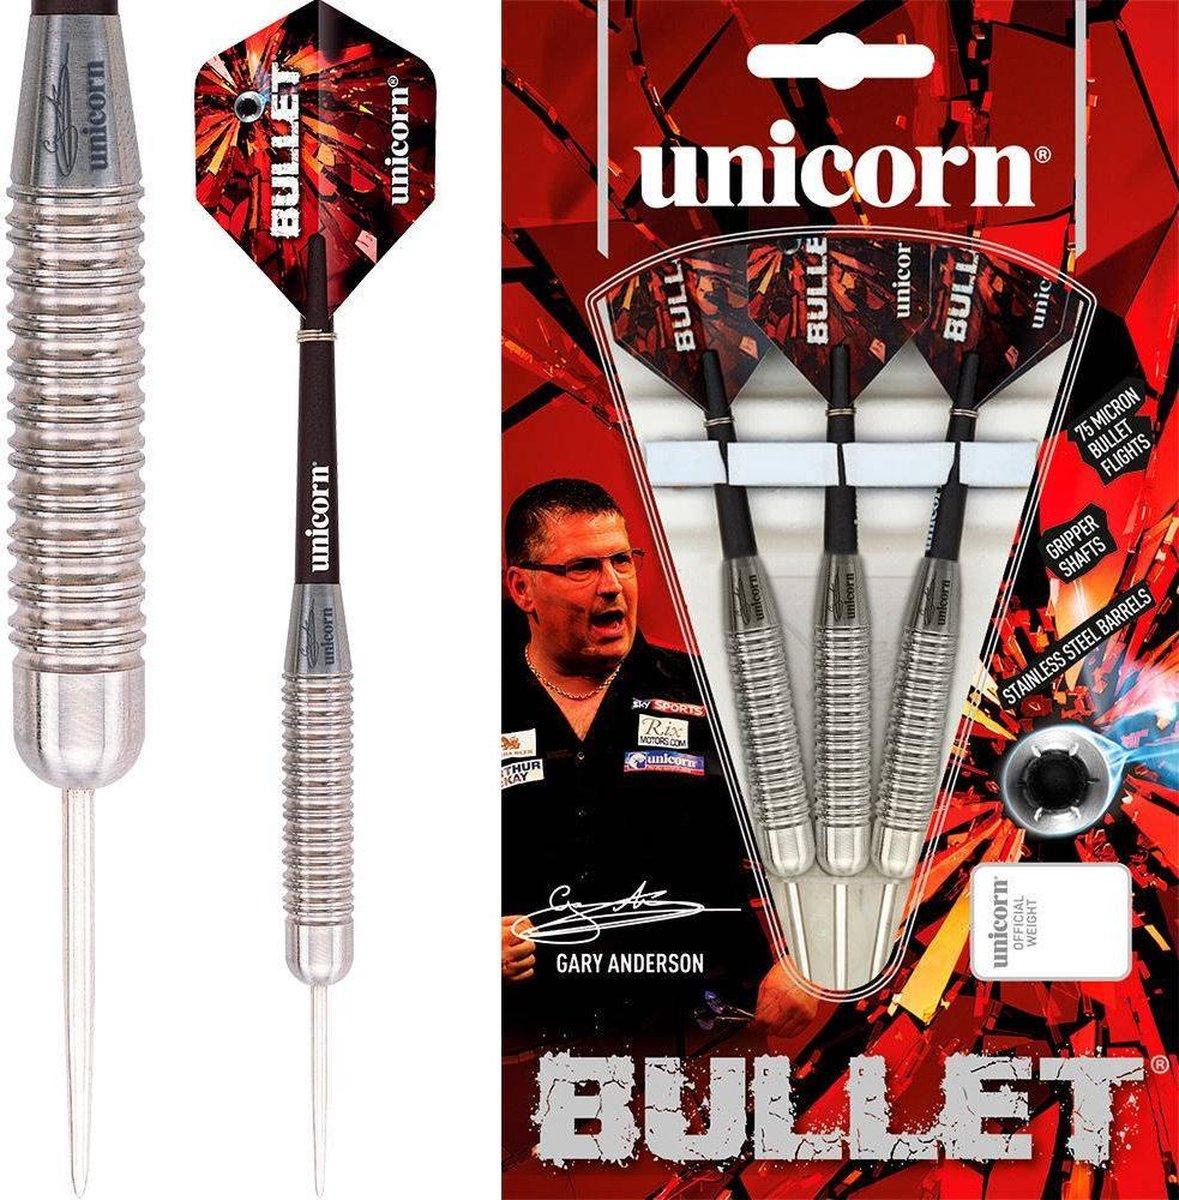 Unicorn Bullet Gary Anderson P1 - 26 Gram